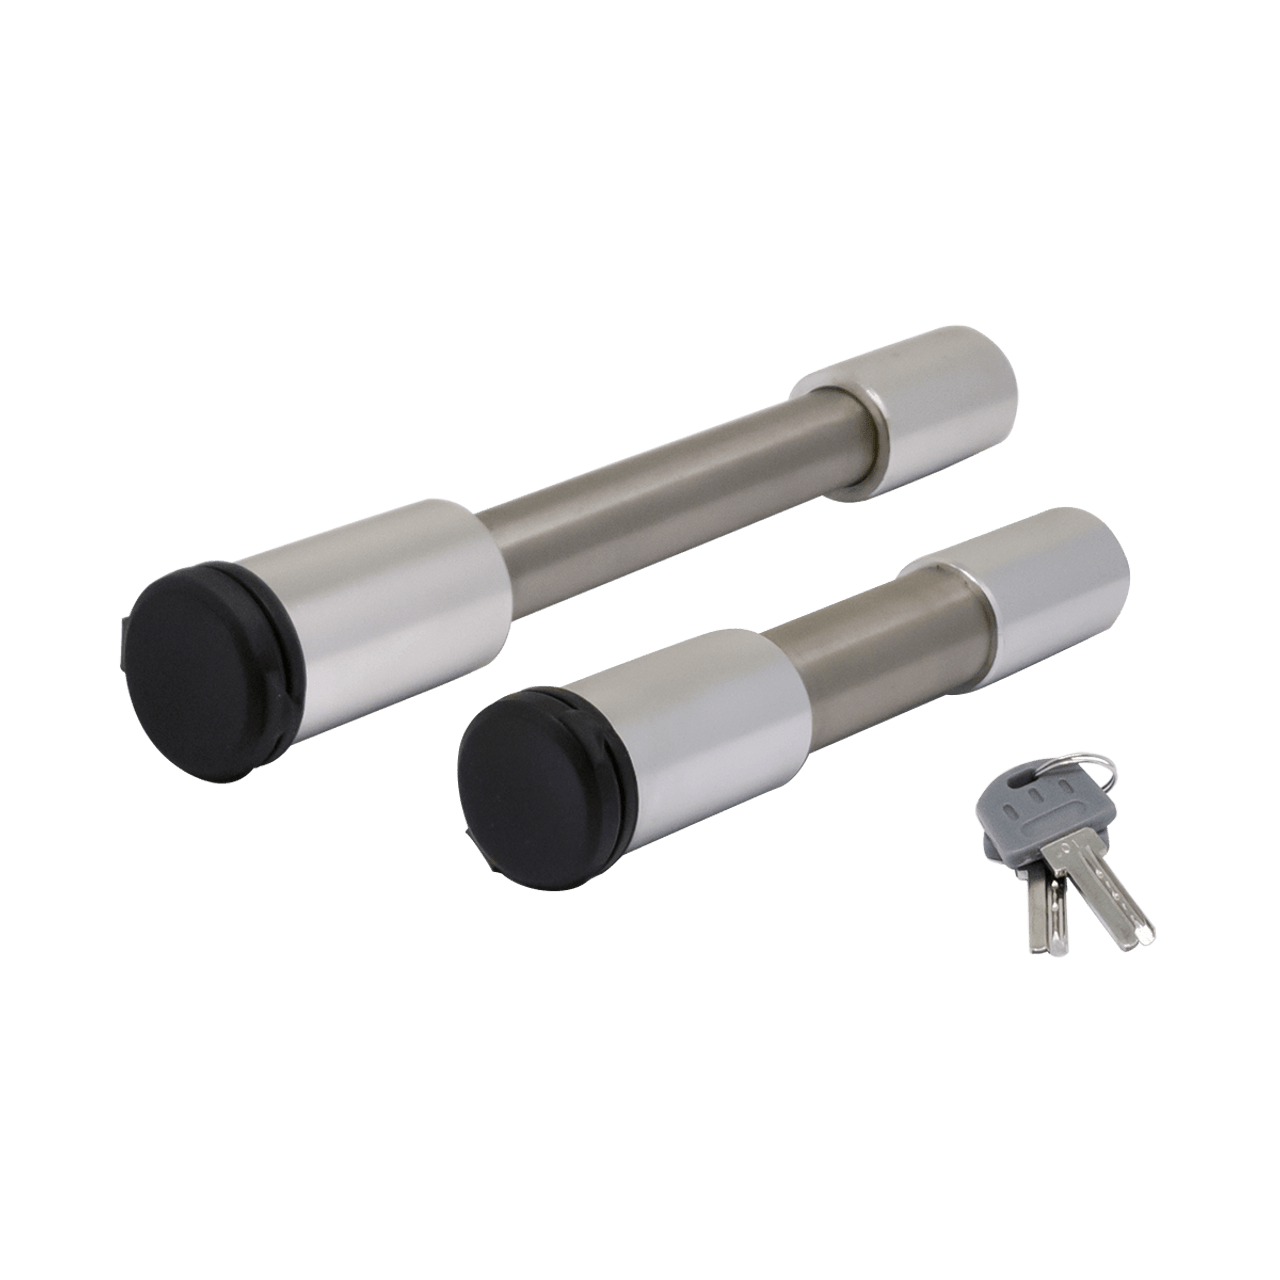 3493 --- Keyed Alike Lock Set for EZ Adjustable Ball Mounts